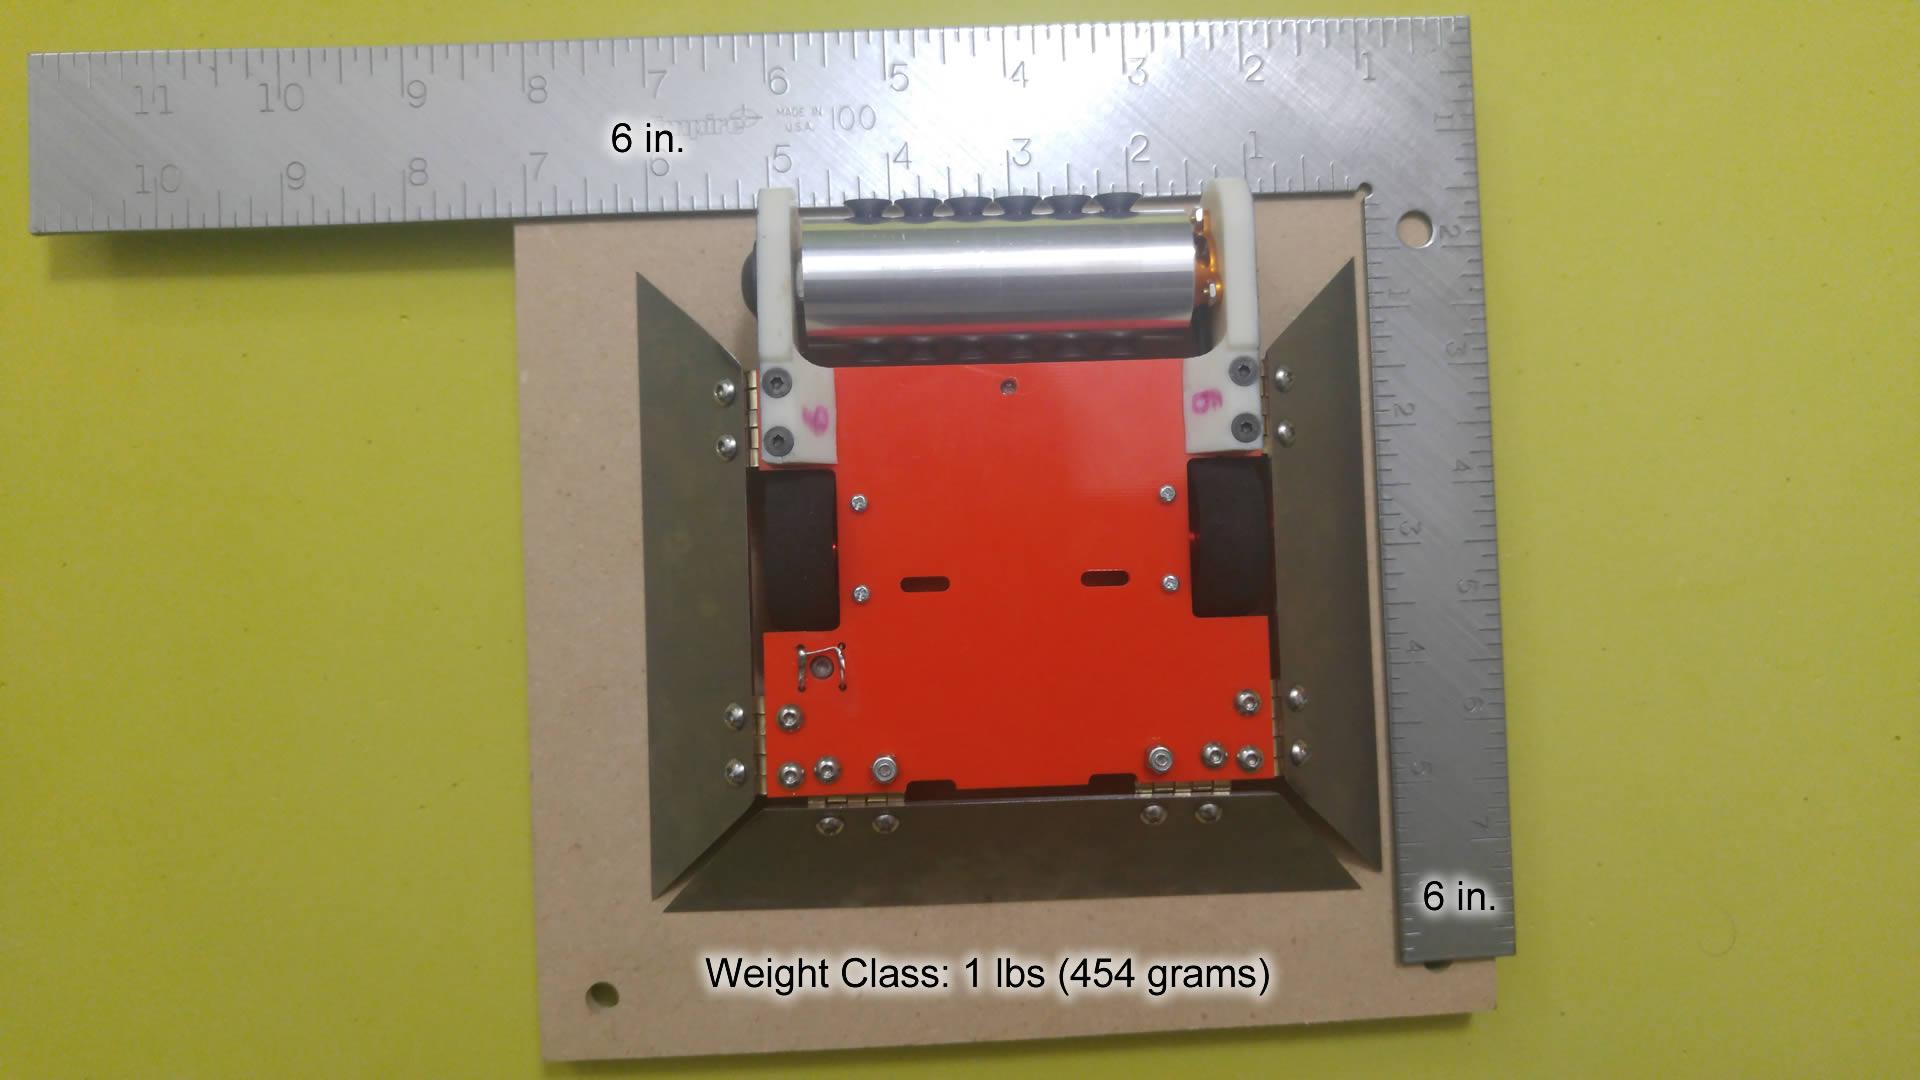 Shrapnelly – 1 lb Antweight Combat Robot | Eleccelerator